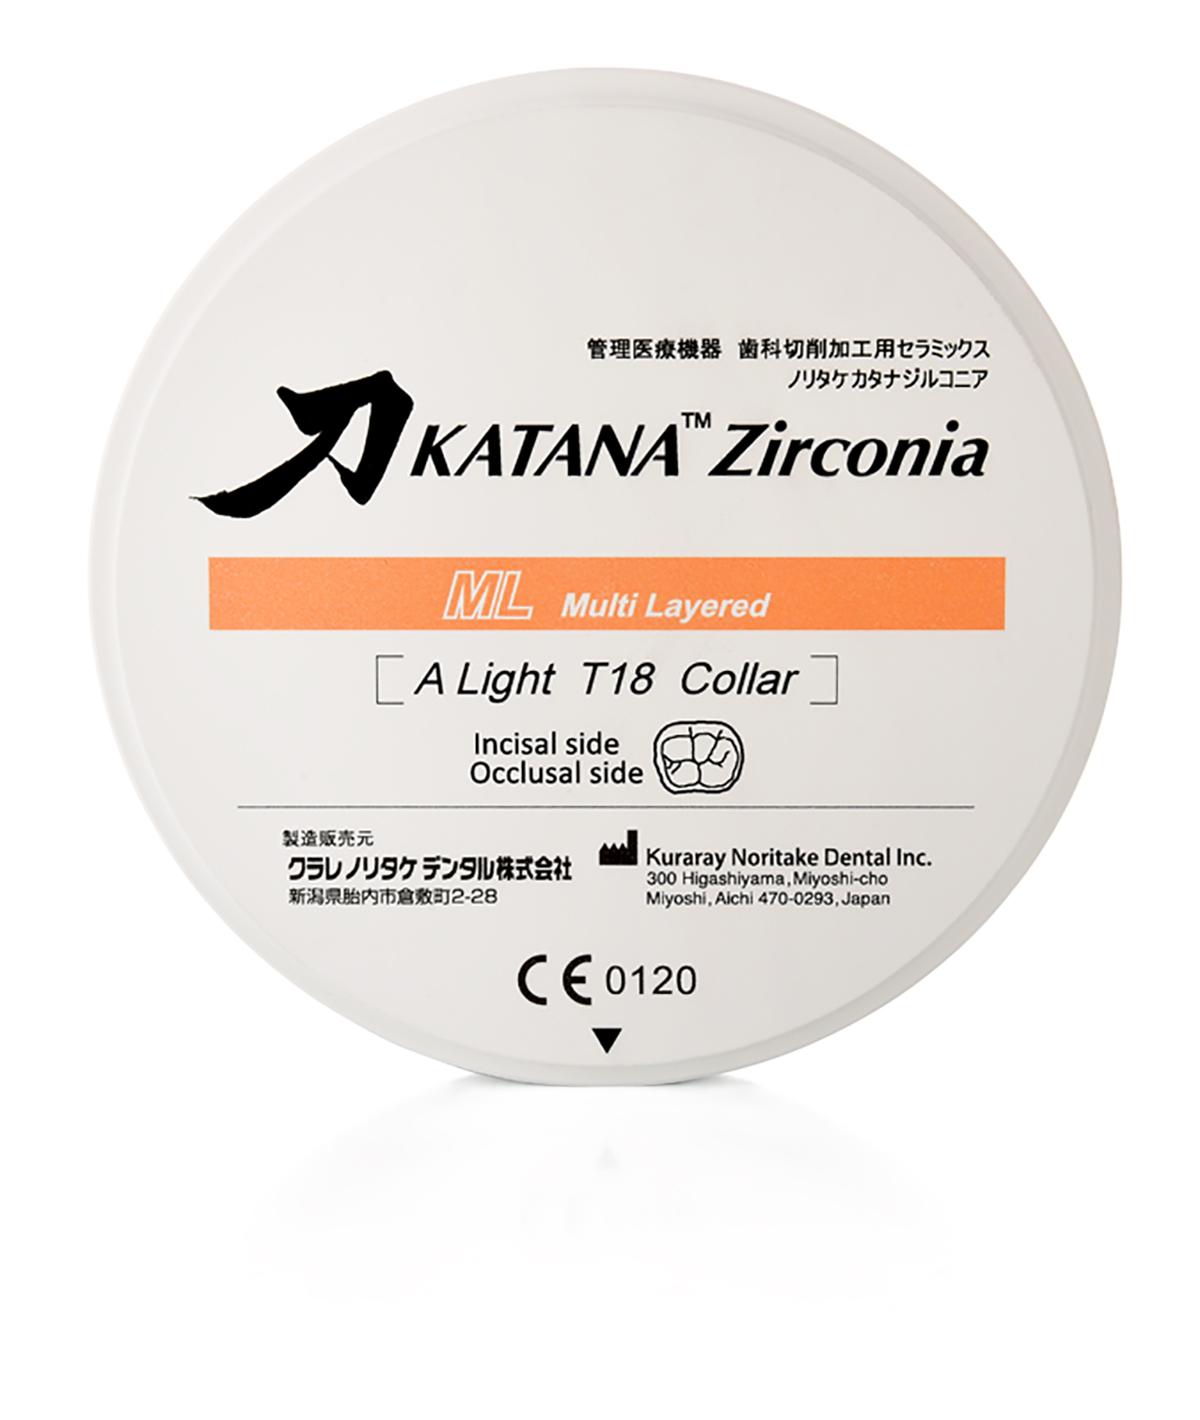 KATANA™ Zirconia ML